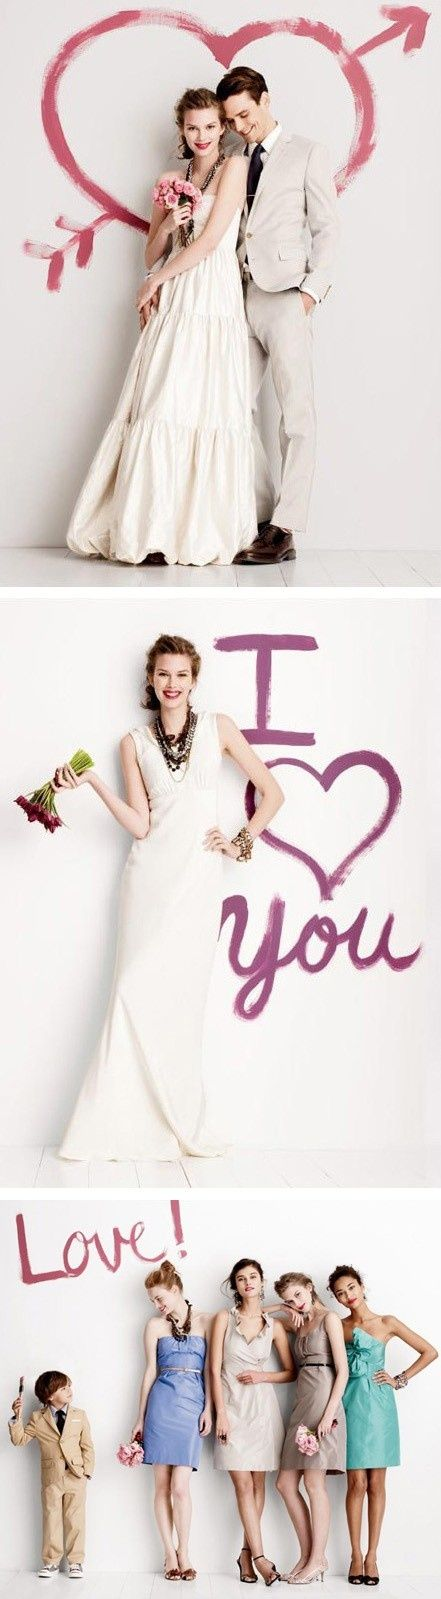 wedding photobooth idea